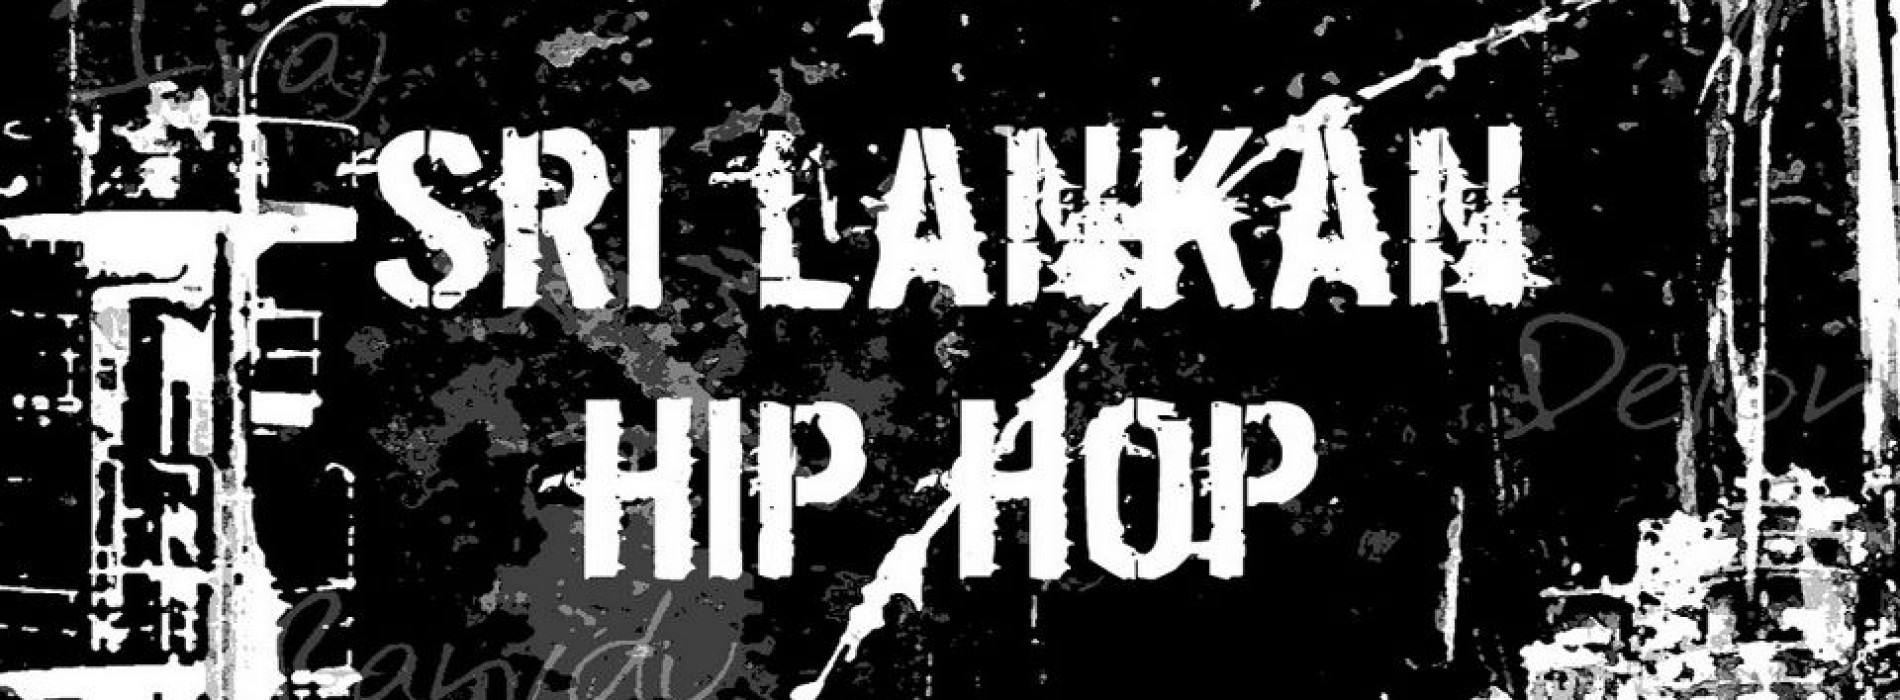 Gangster Maradana – Sri lankan Hip Hop